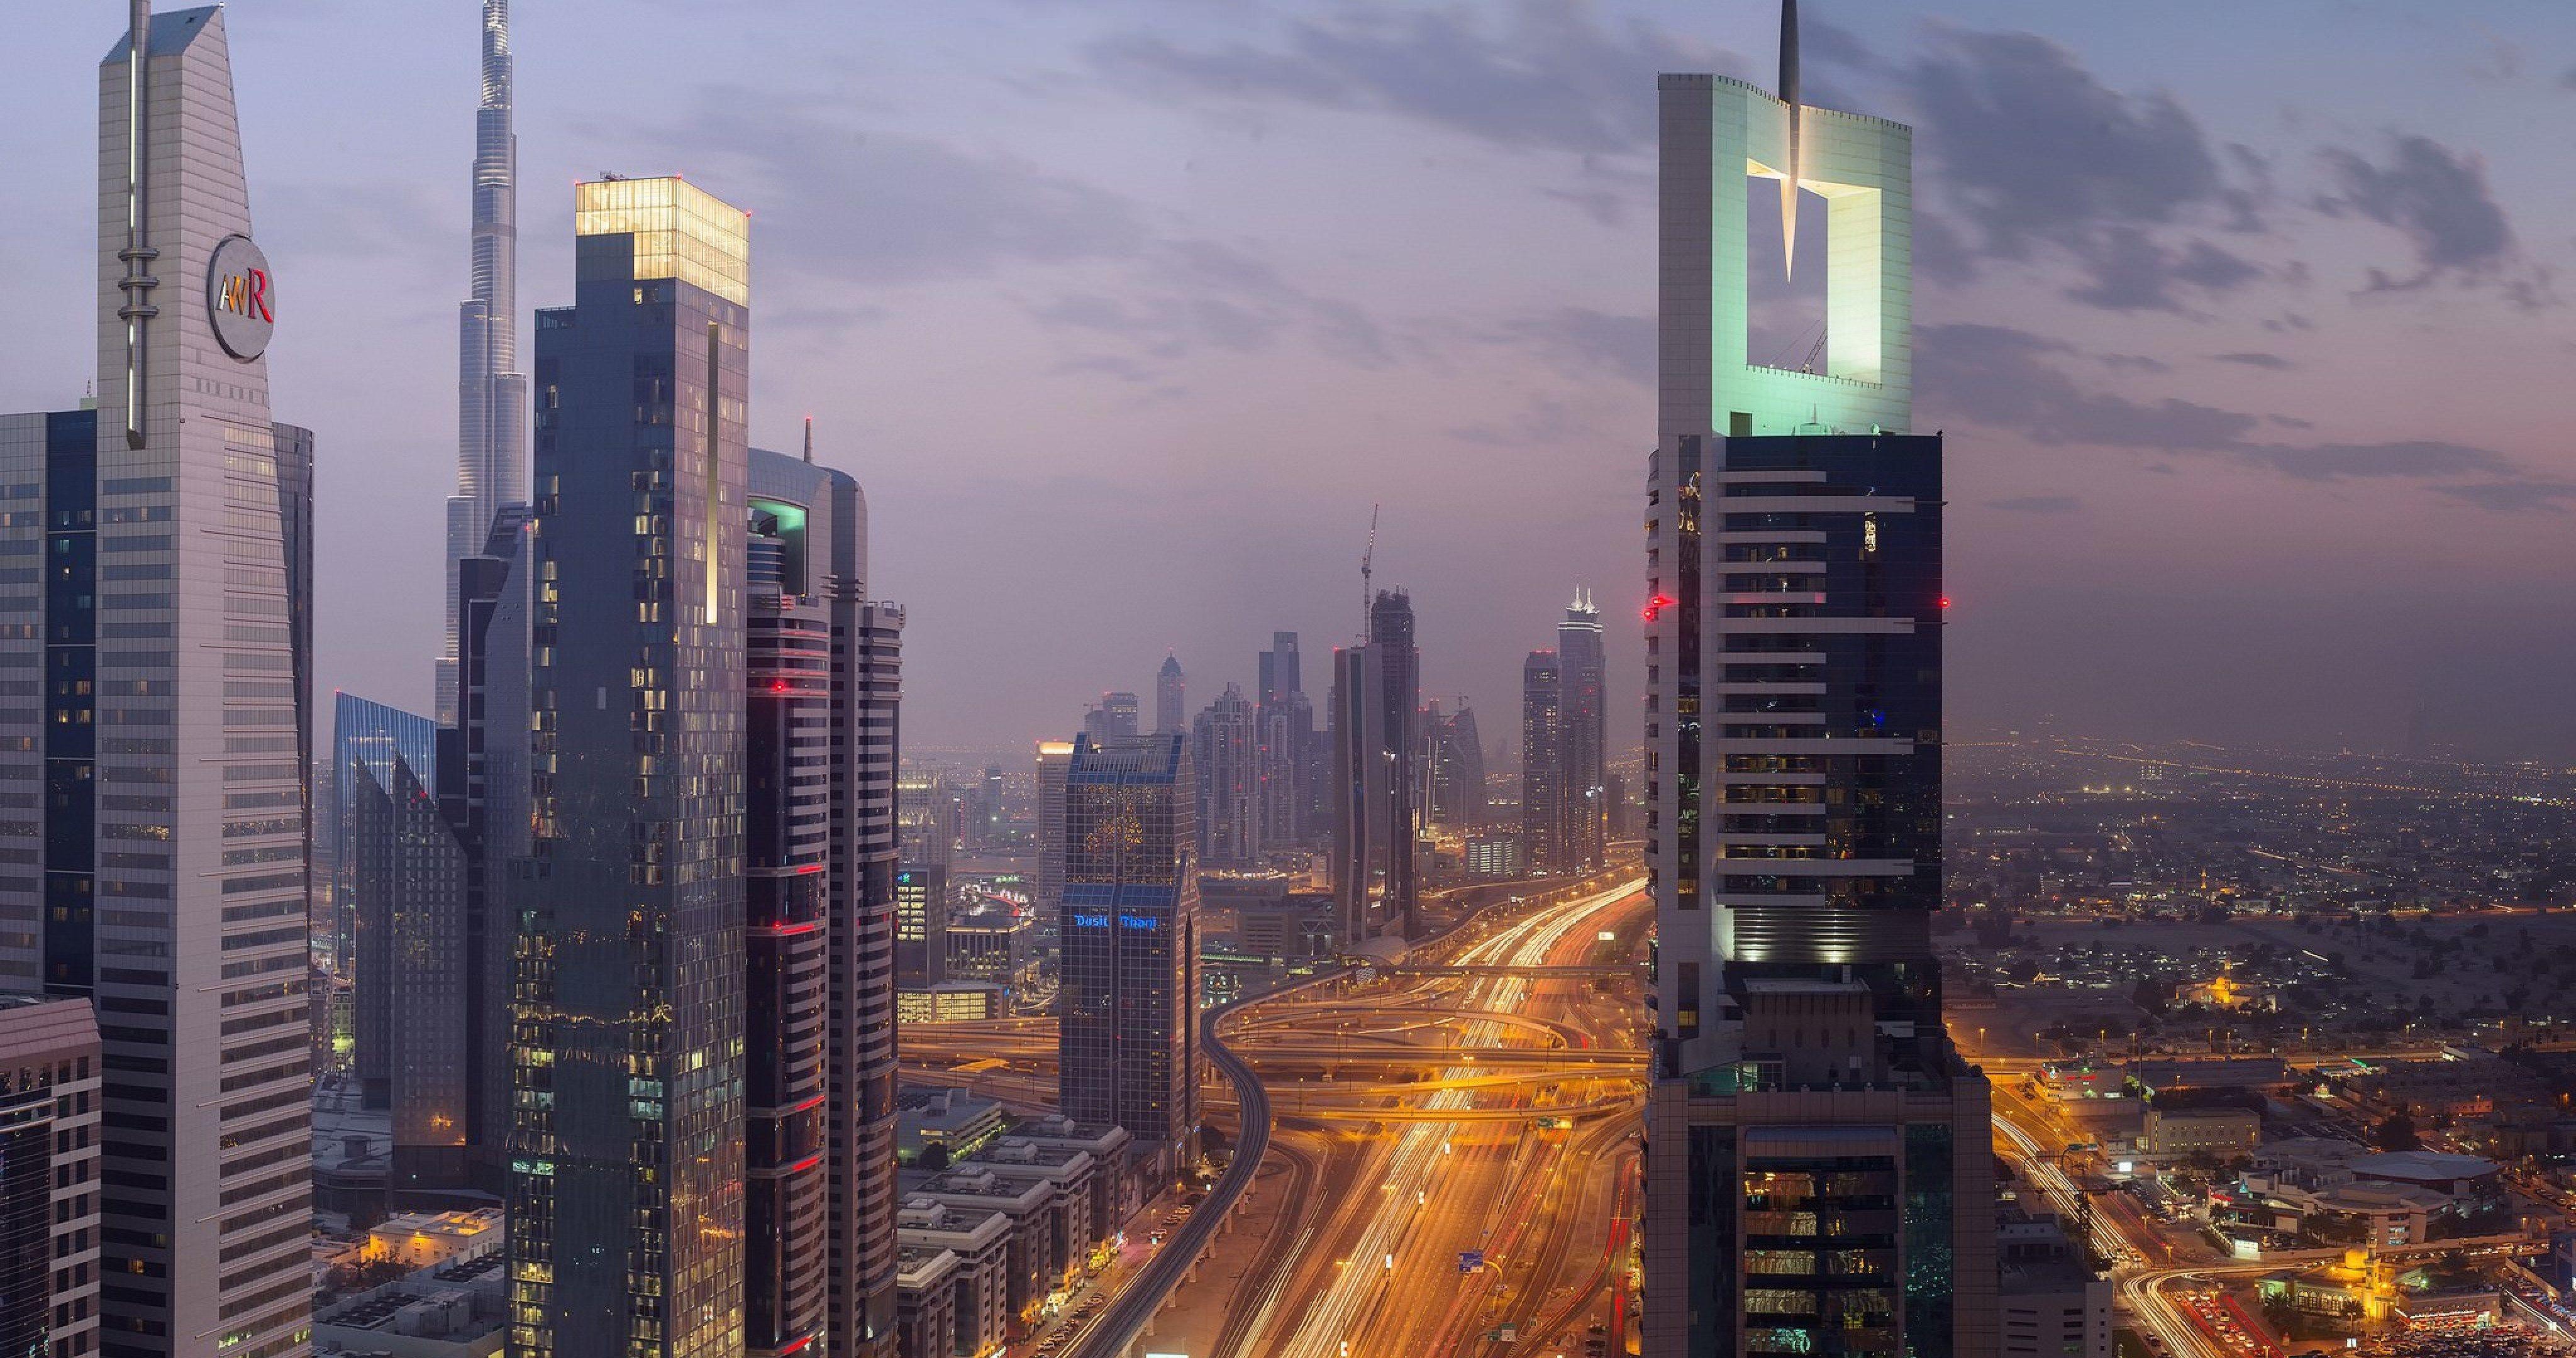 Dubai 4k Wallpaper: Uae City Of Dubai Lights 4k Ultra Hd Wallpaper